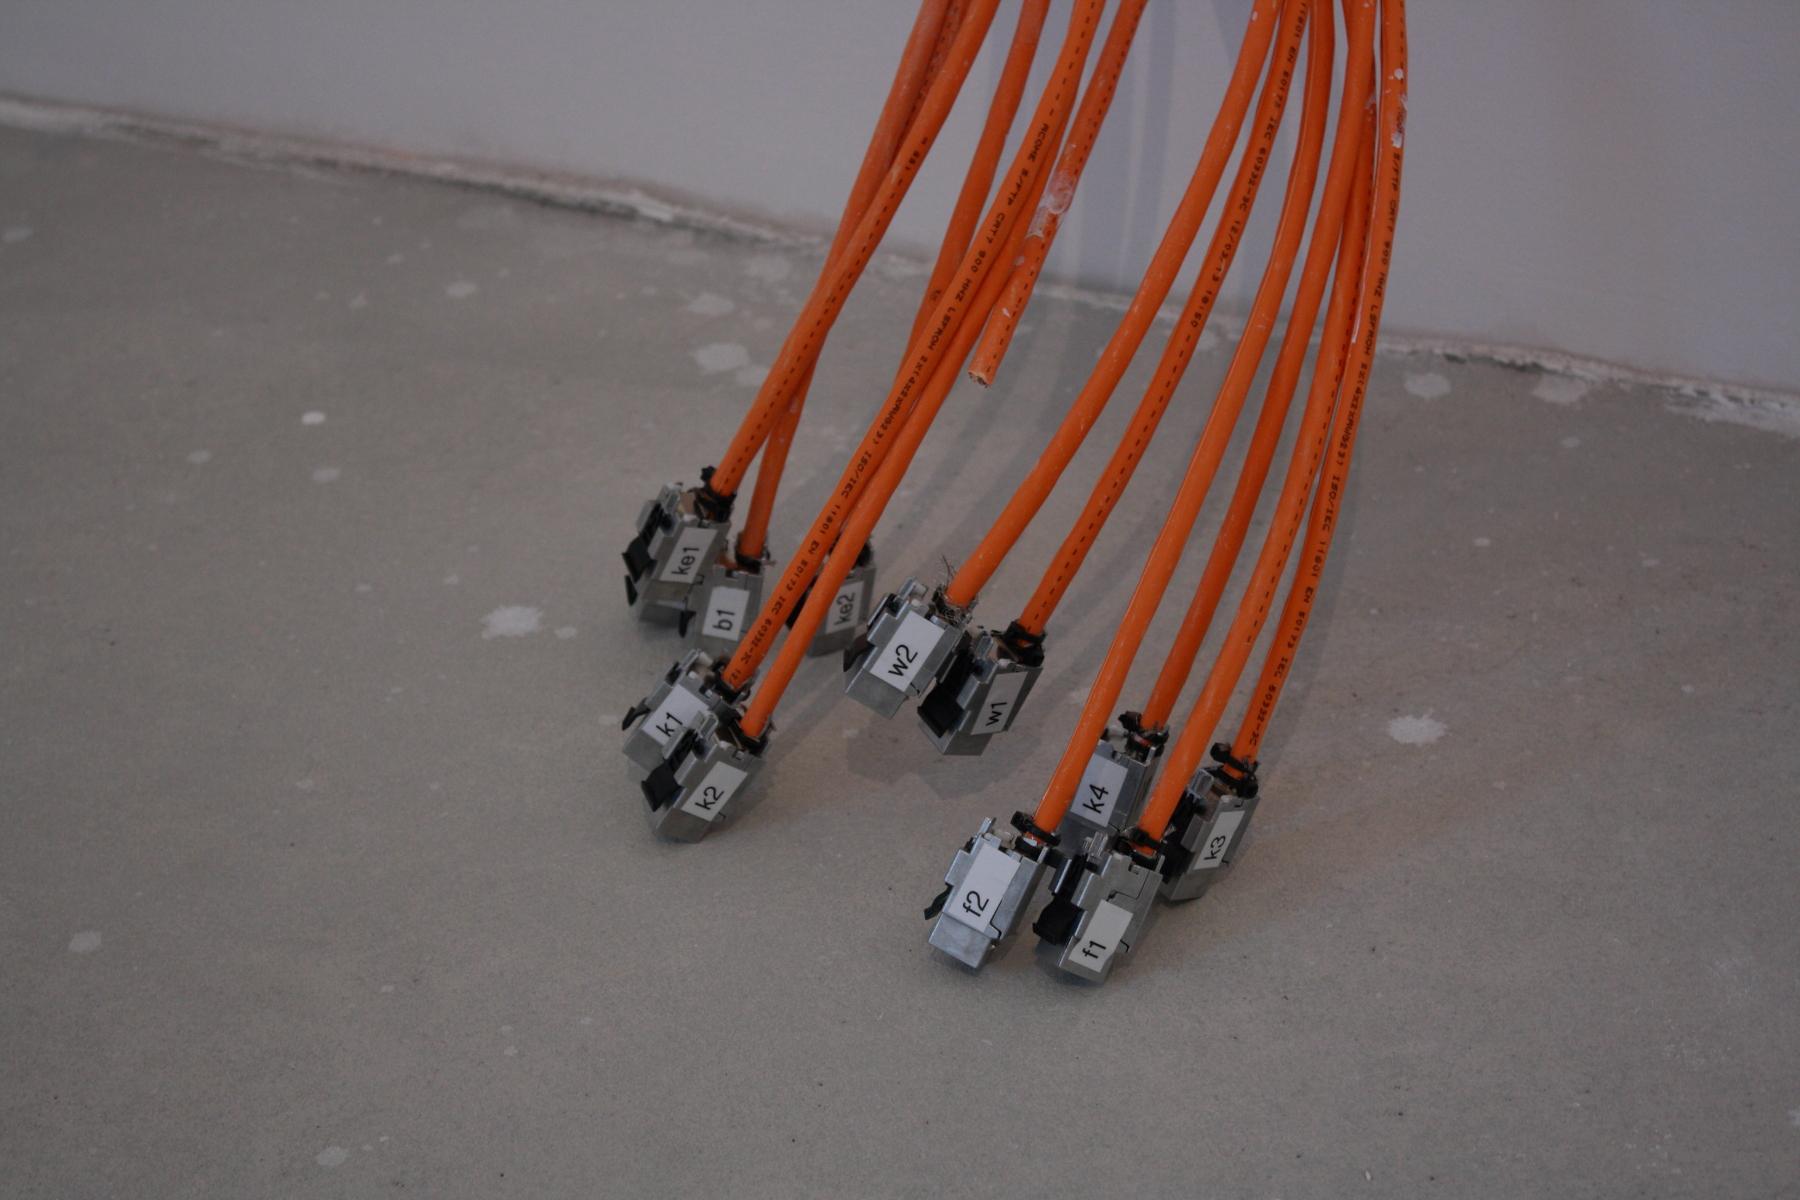 lan kabel verlegen lan kabel verlegen elektroinstallation bild 13 lan kabel verlegen aber wie. Black Bedroom Furniture Sets. Home Design Ideas